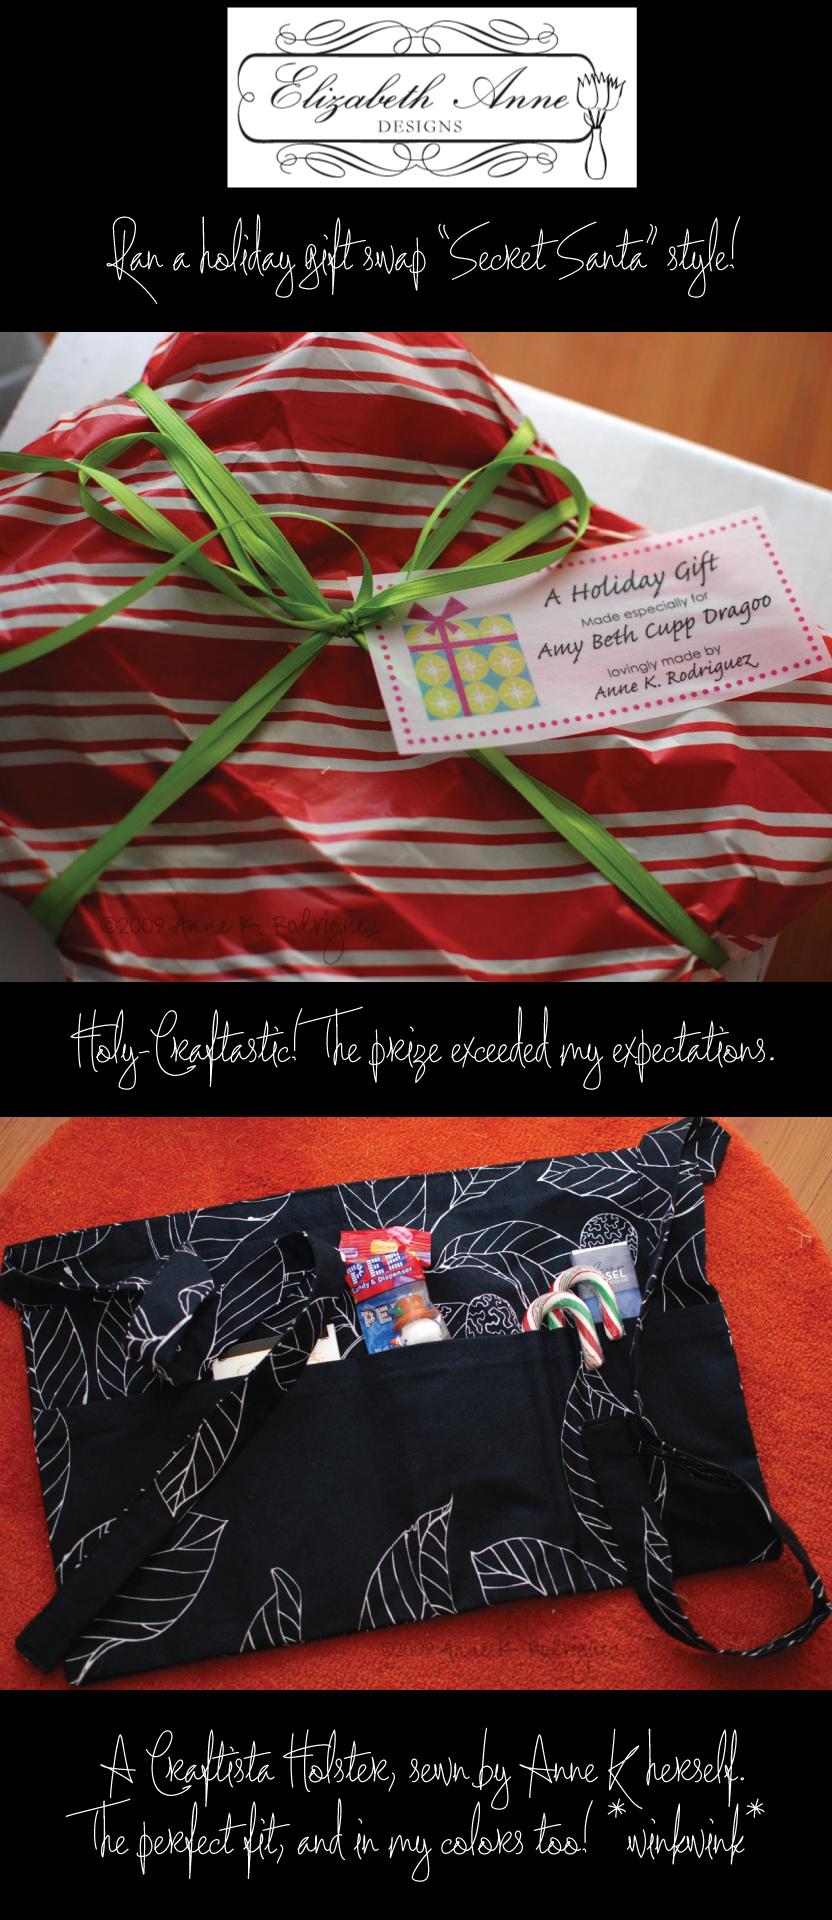 EADL Holiday Secret Santa Swap